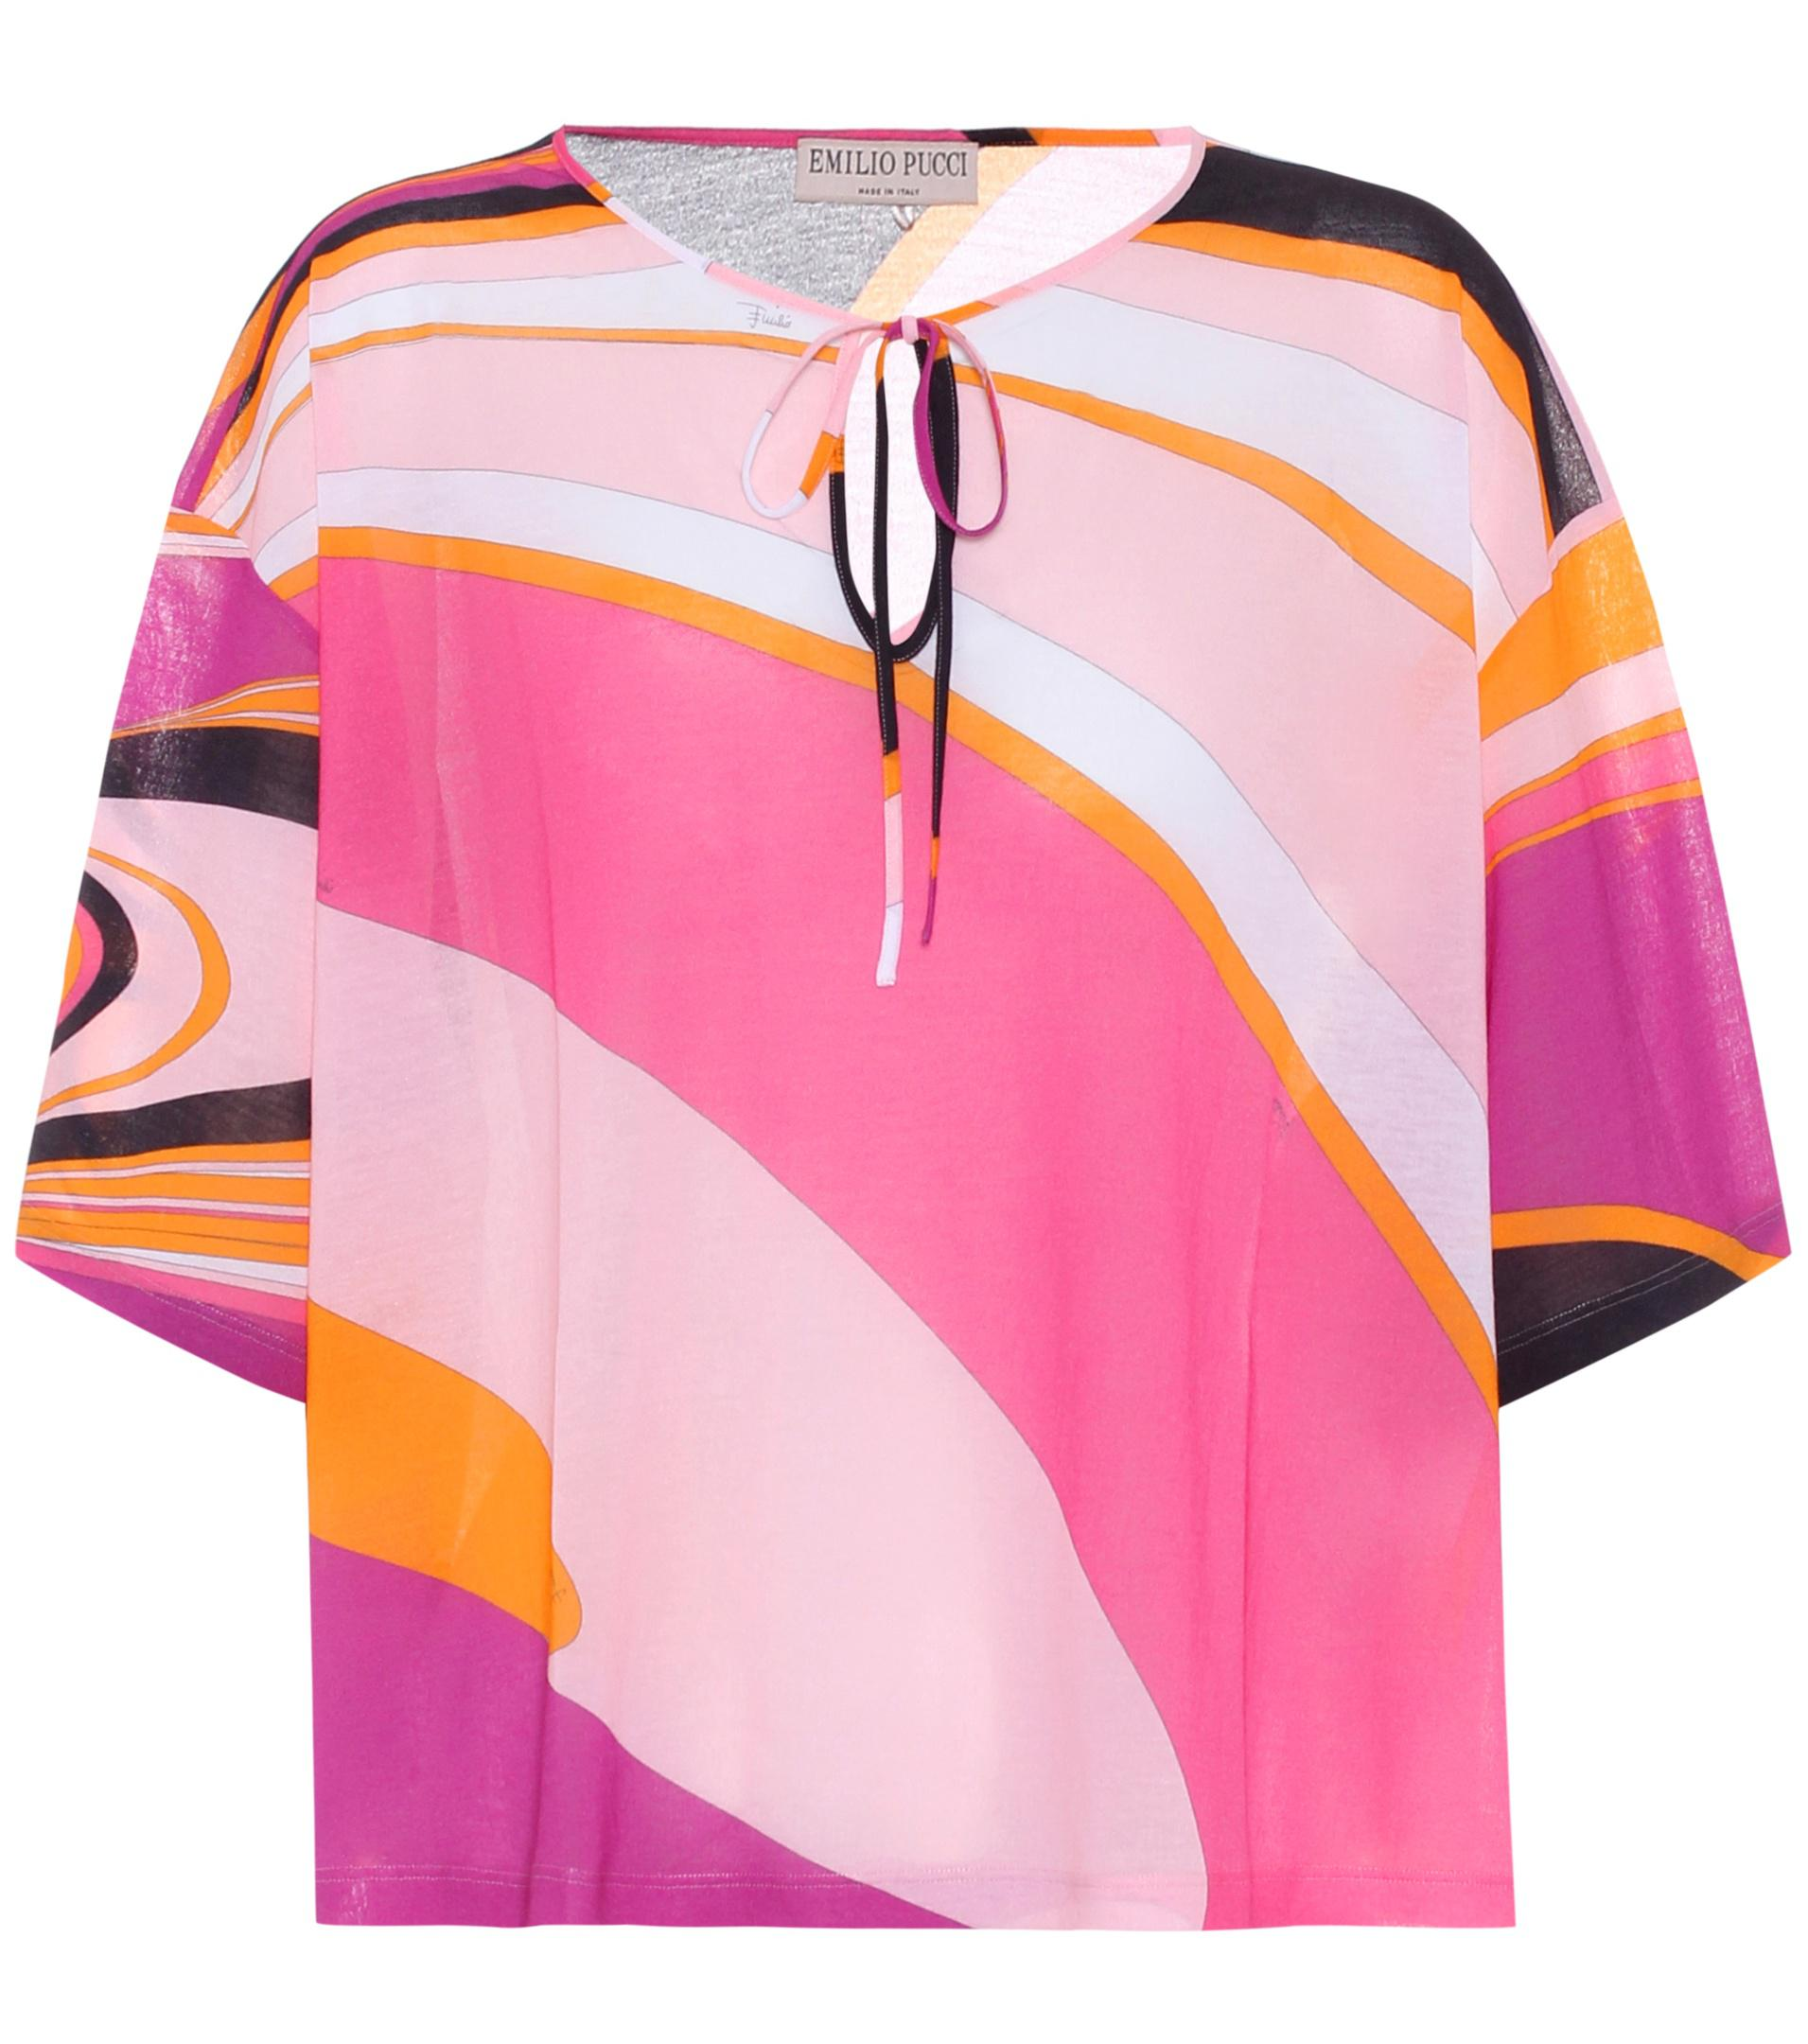 Sale 2018 Purchase Online printed shirt - Pink & Purple Emilio Pucci TGXgQ5xE6c